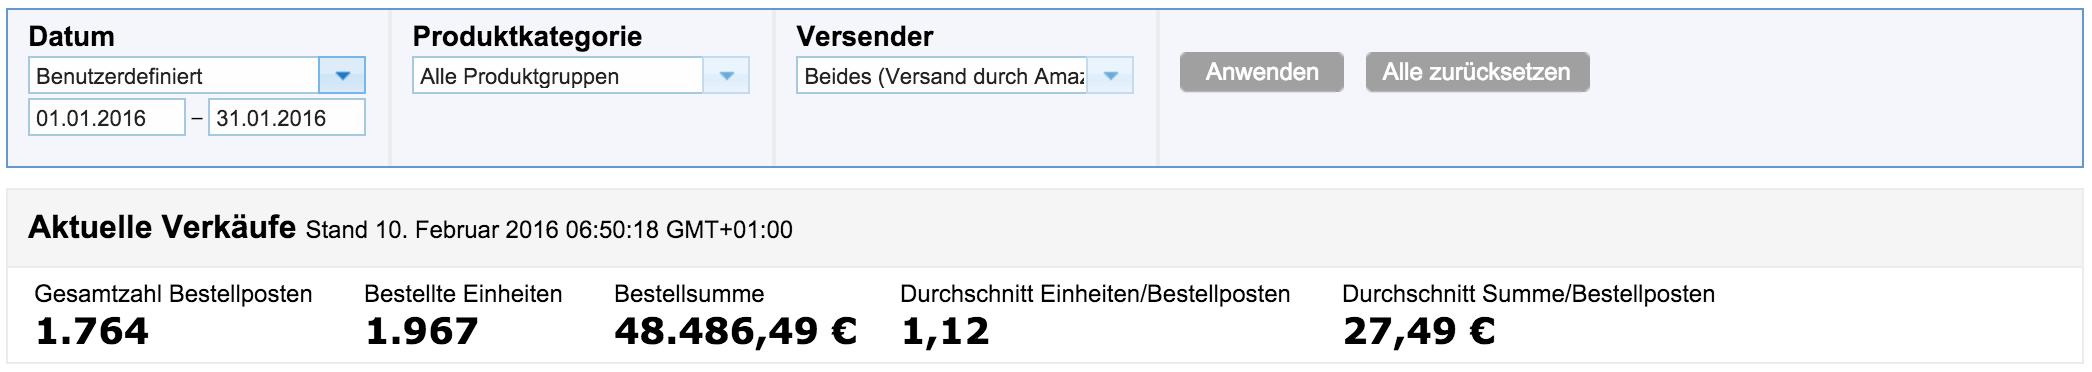 Mein Amazon Januar 2016 Bericht: 48.486,49€